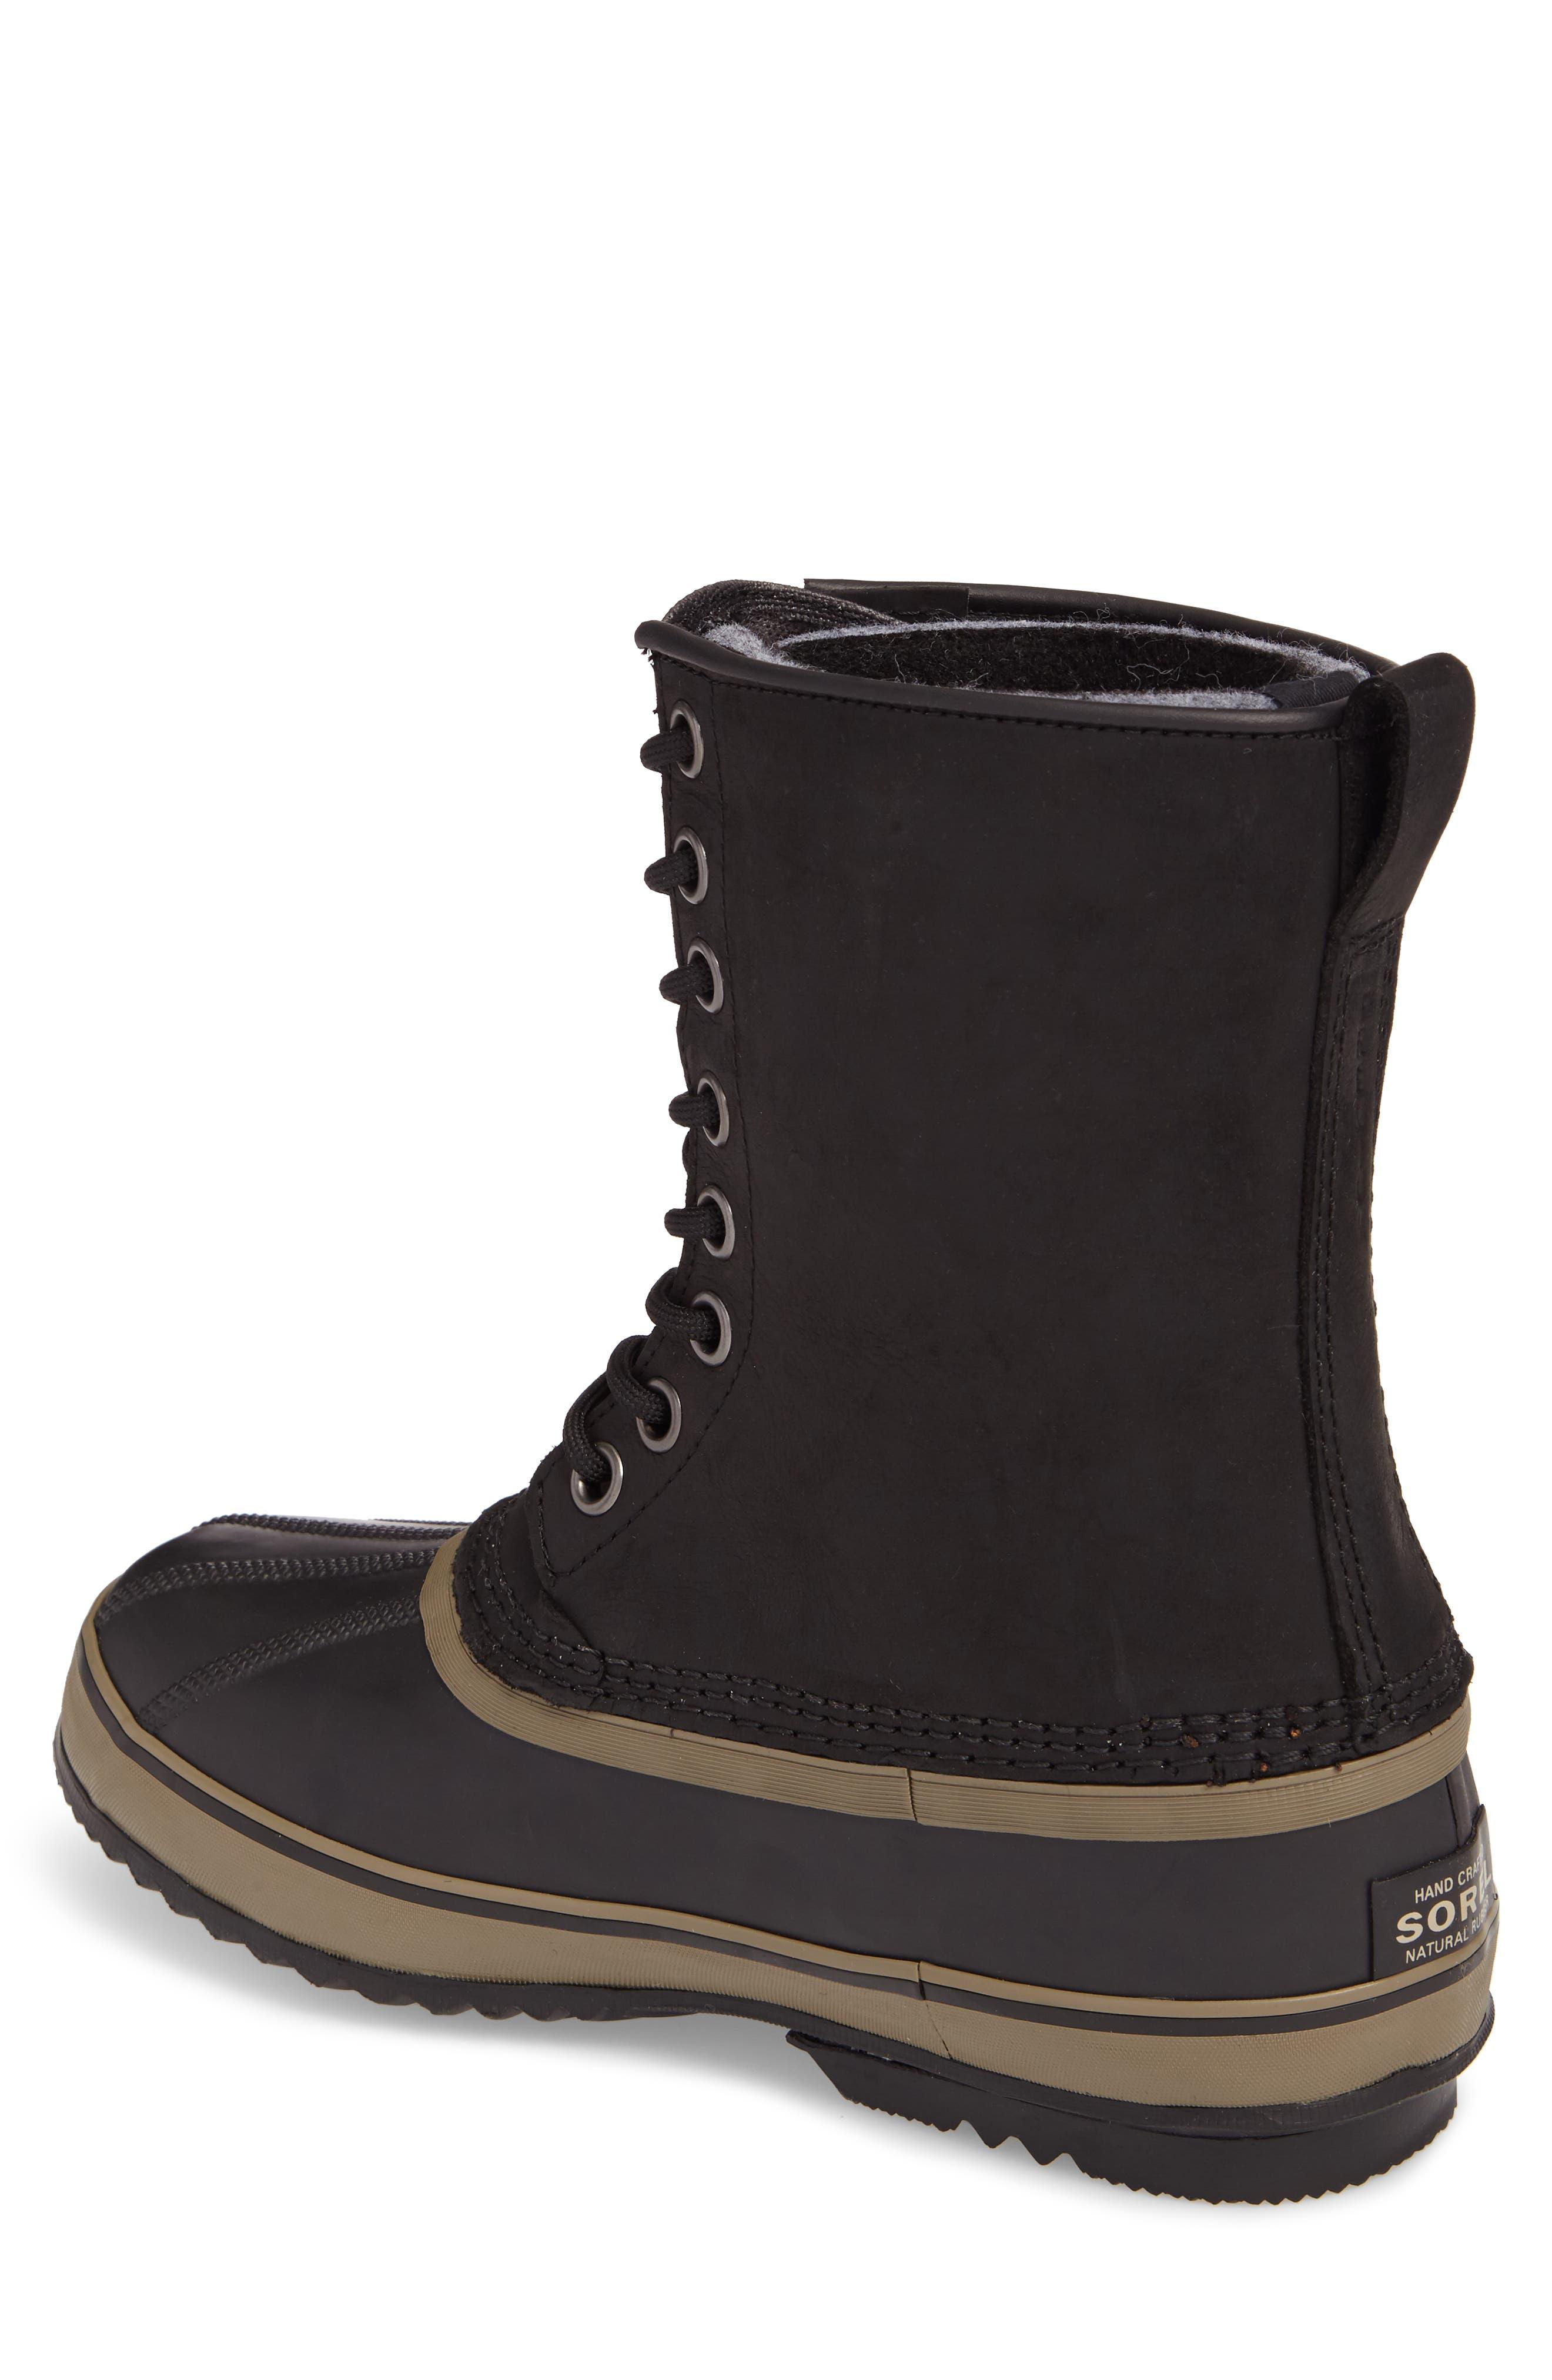 1964 Premium T Snow Waterproof Boot,                             Alternate thumbnail 2, color,                             BLACK LEATHER